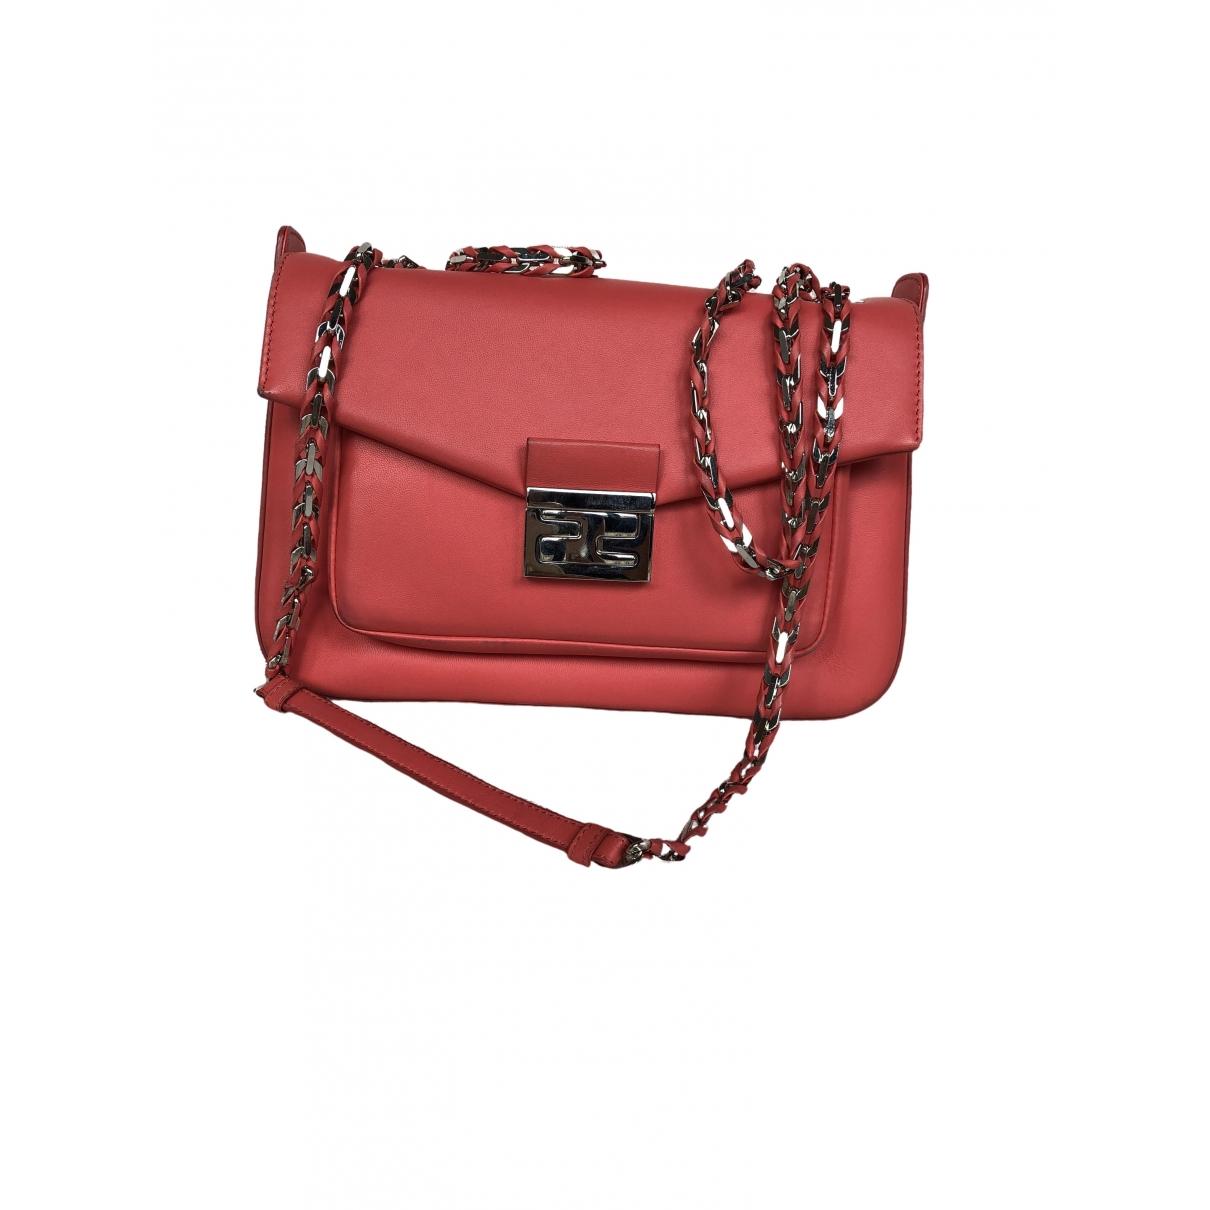 Fendi Baguette Pink Leather handbag for Women \N